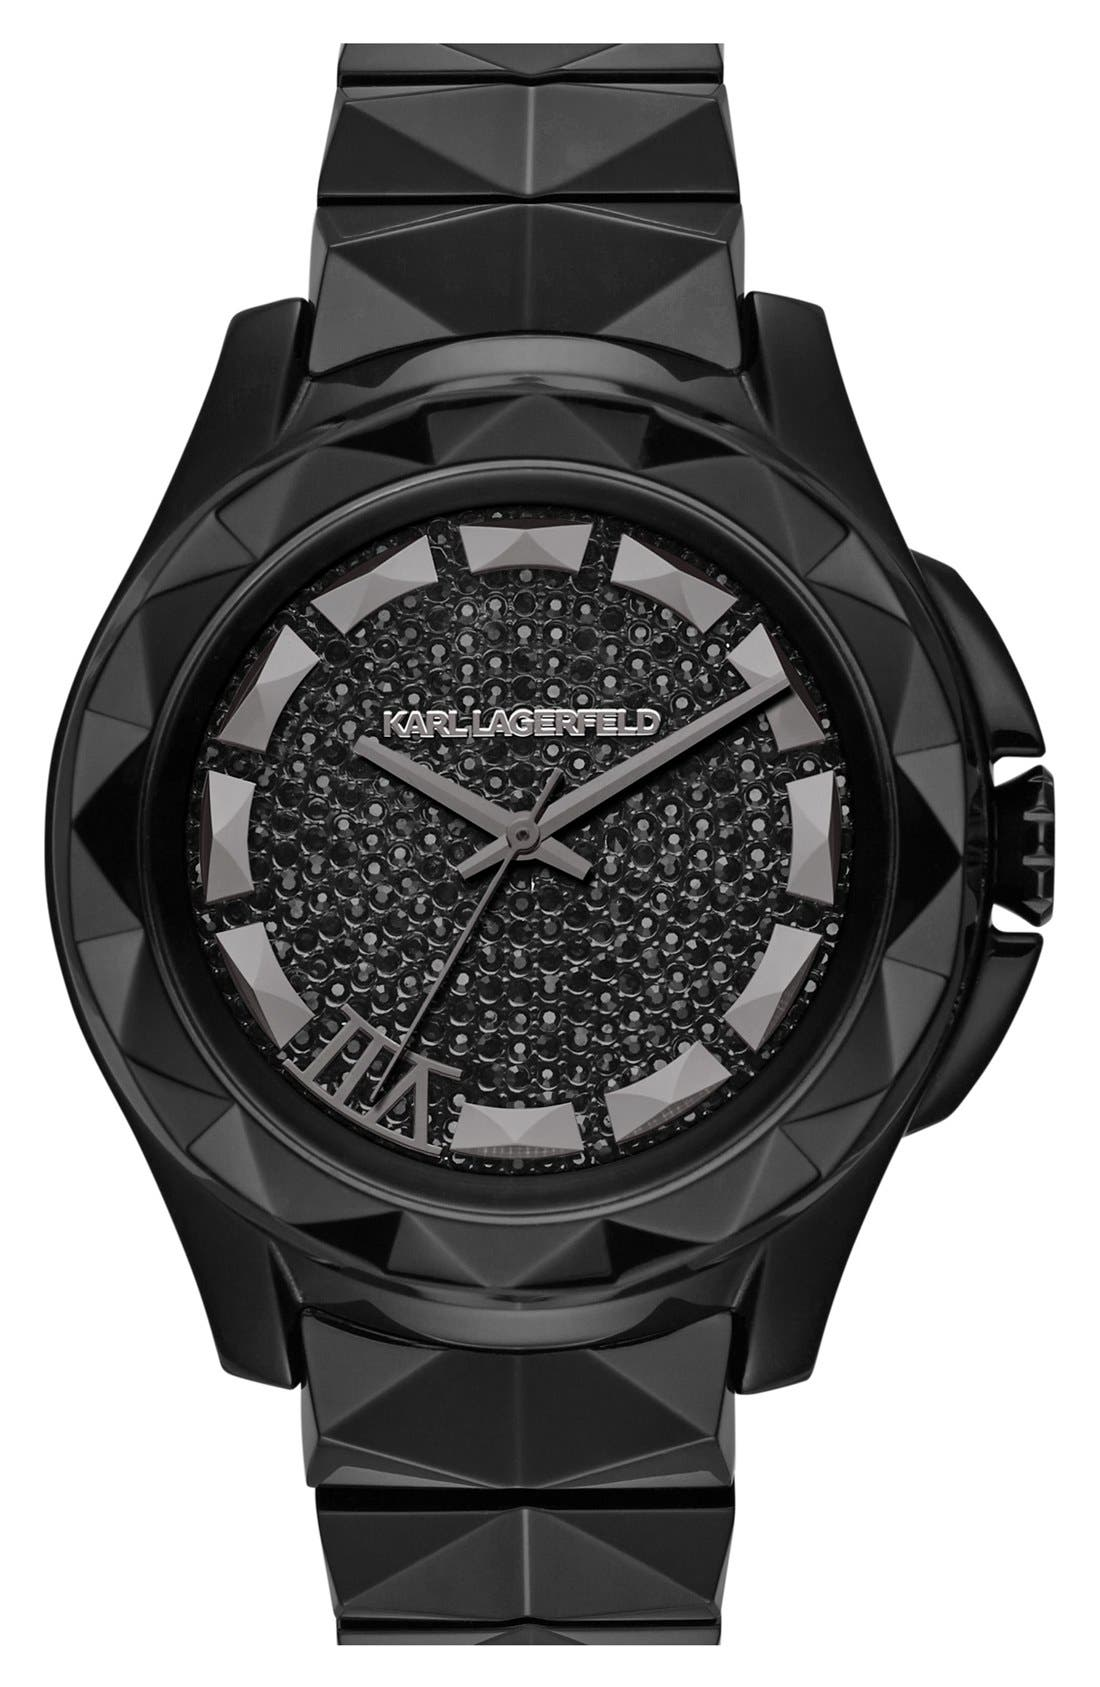 Alternate Image 1 Selected - KARL LAGERFELD '7' Faceted Bezel Ceramic Bracelet Watch, 44mm